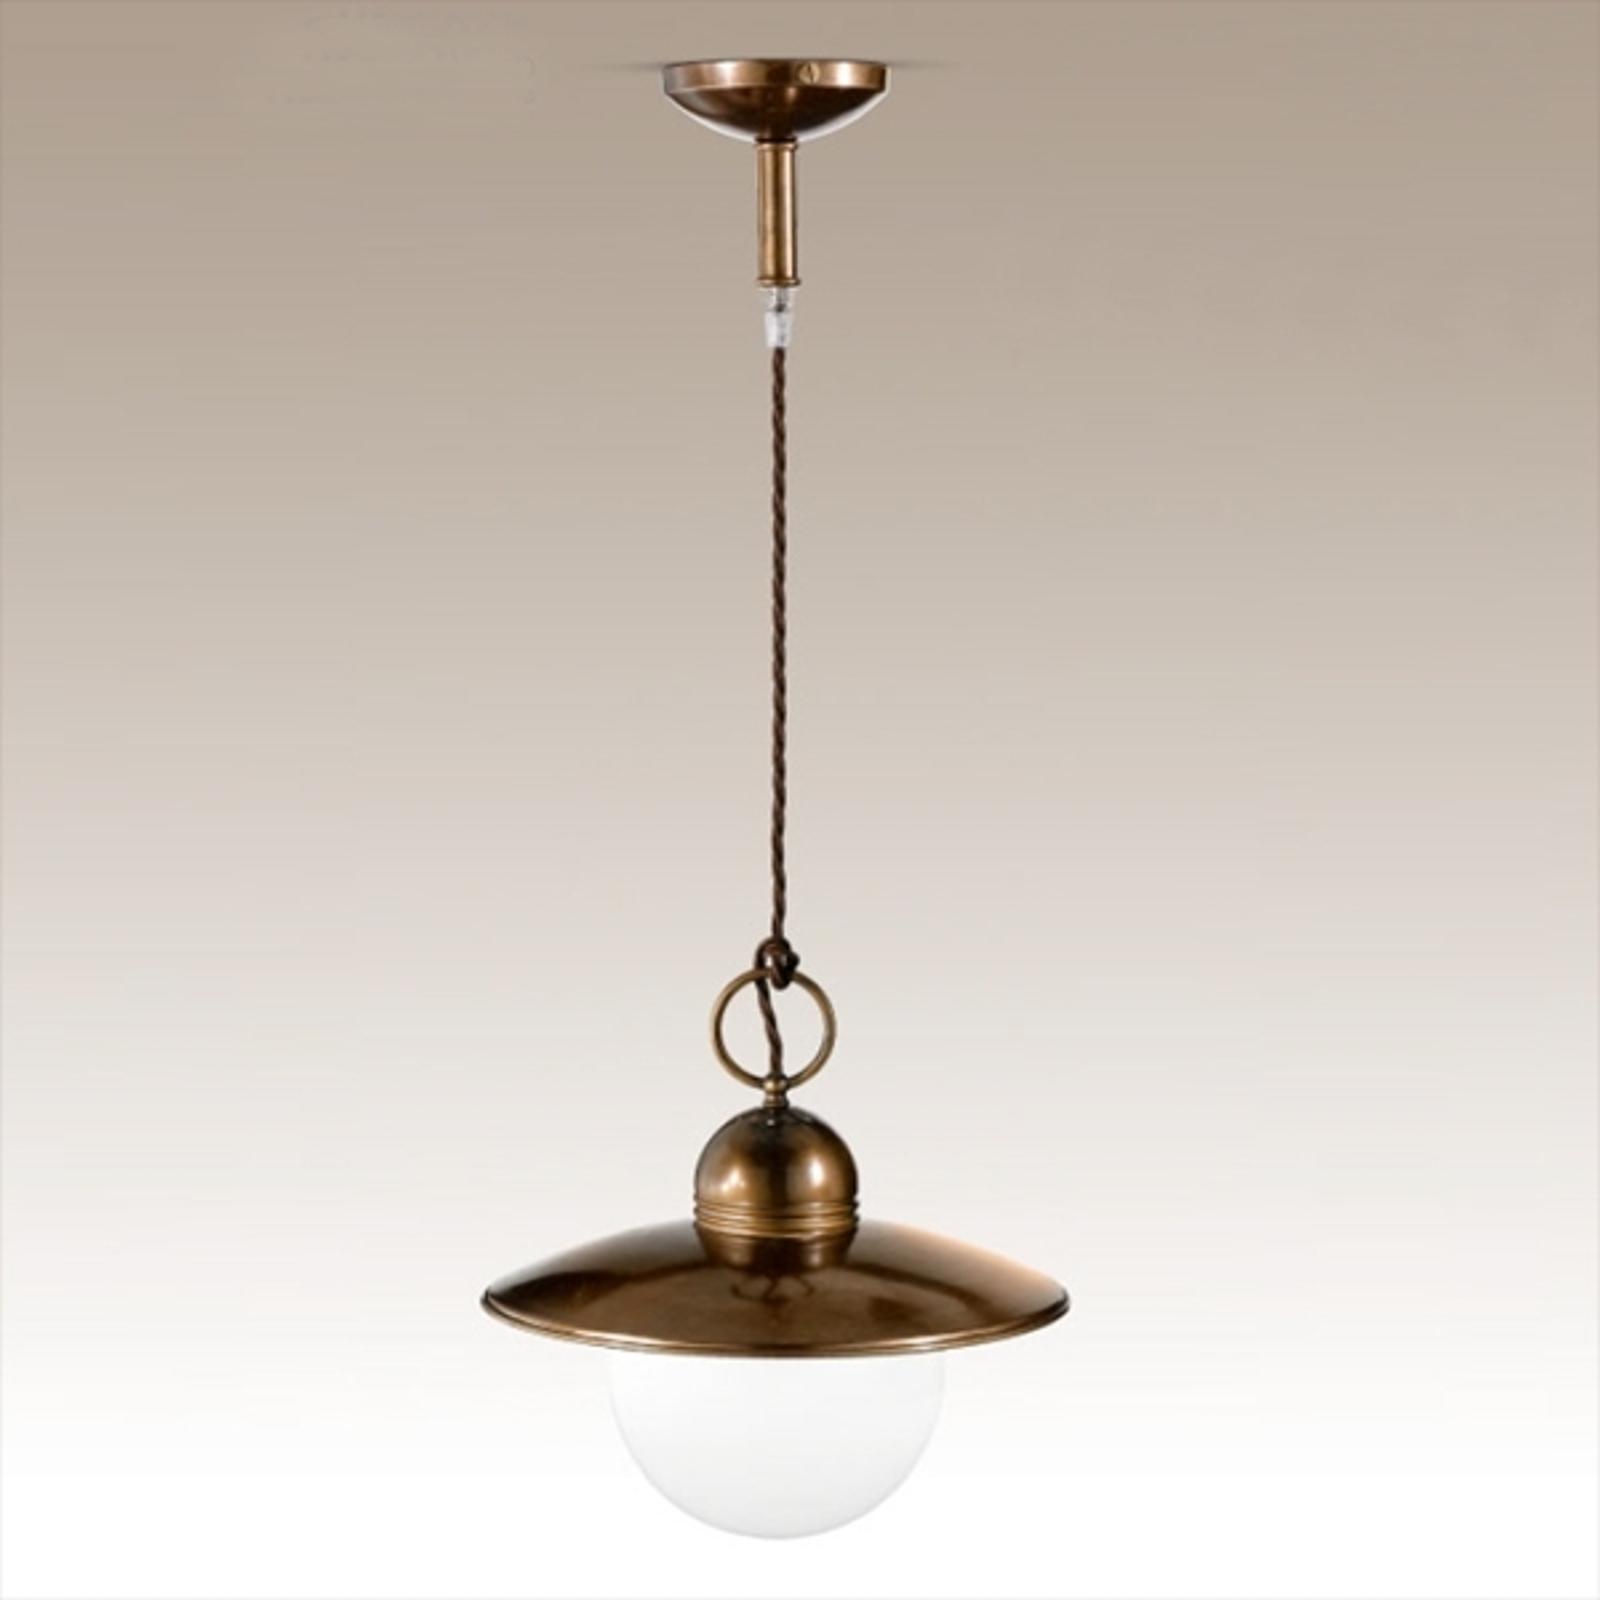 Affascinante lampada a sospensione Taverna